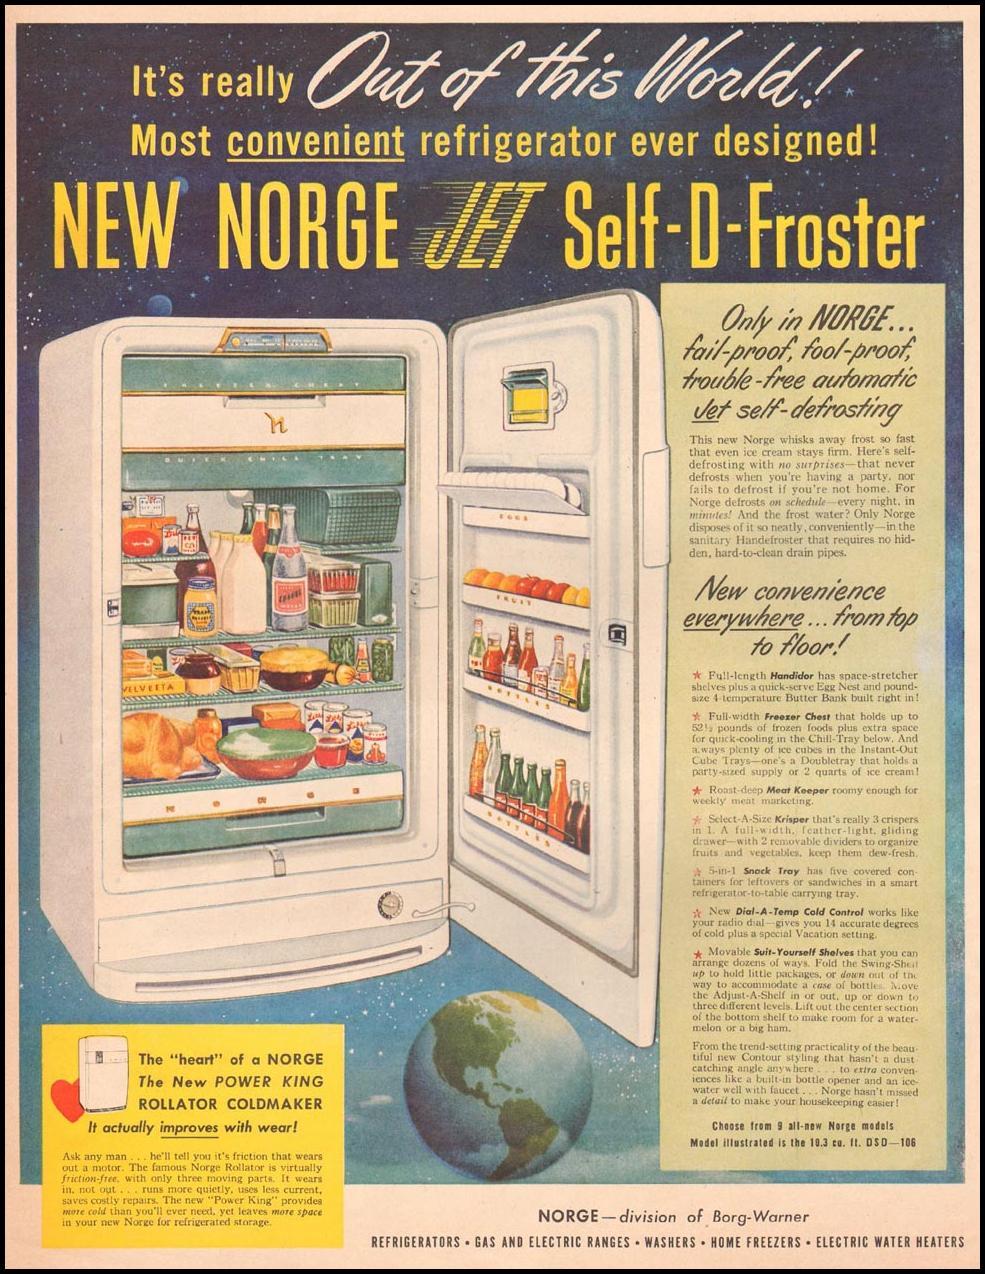 NORGE REFRIGERATORS LIFE 04/30/1951 p. 54